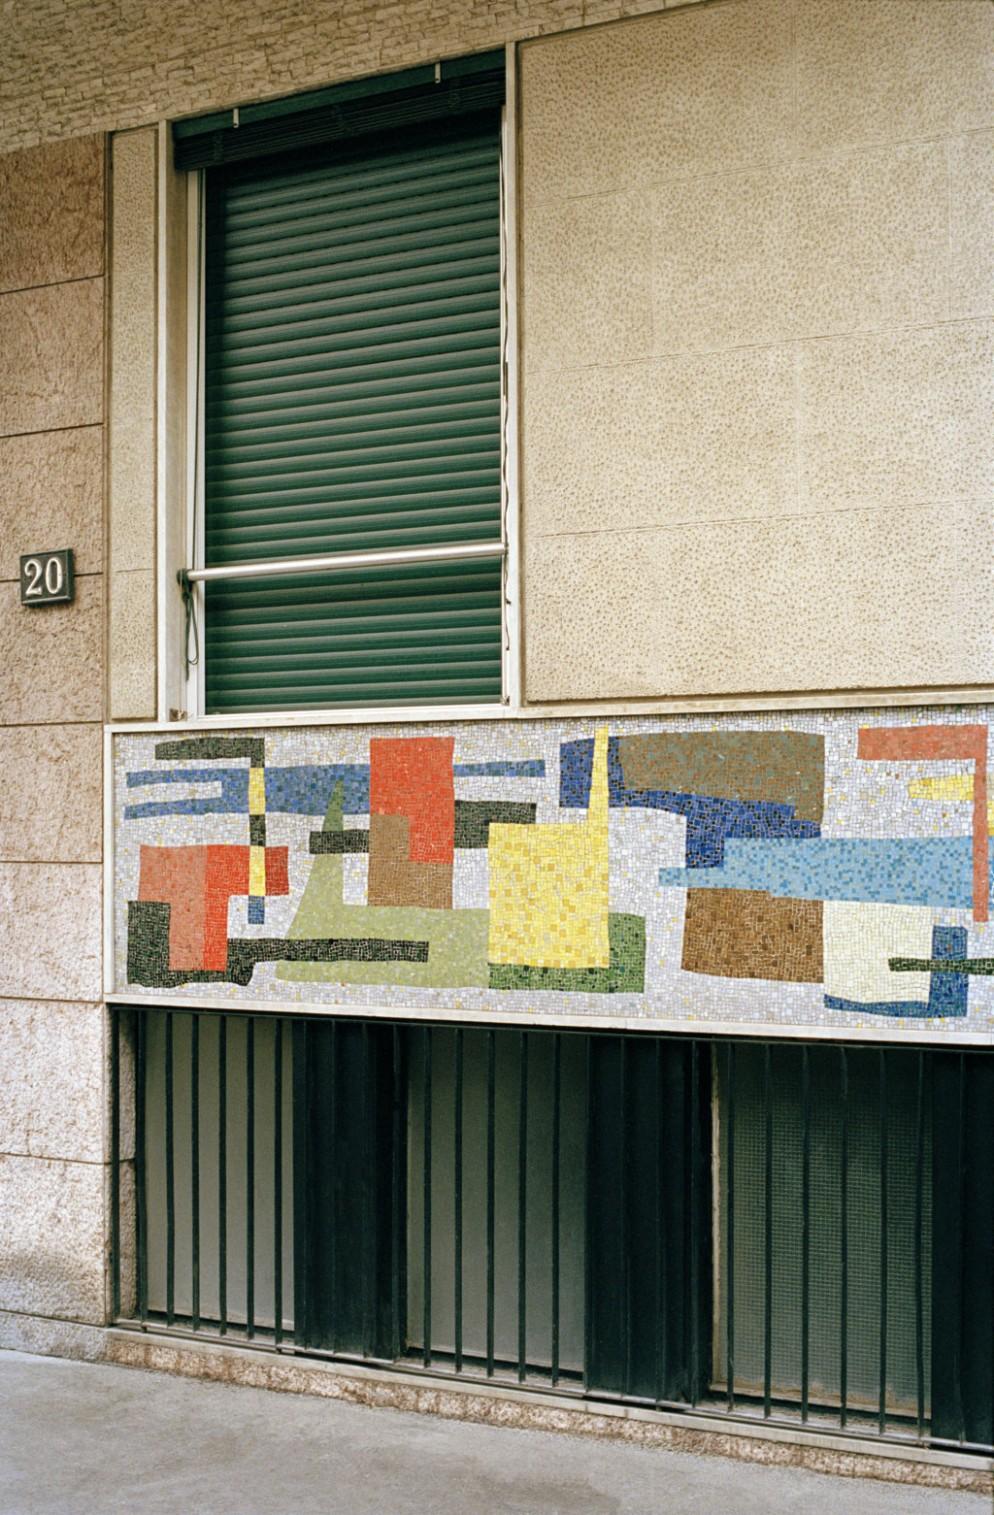 milano-architettura-025 -ph_stefan-giftthaler-livingcorriere